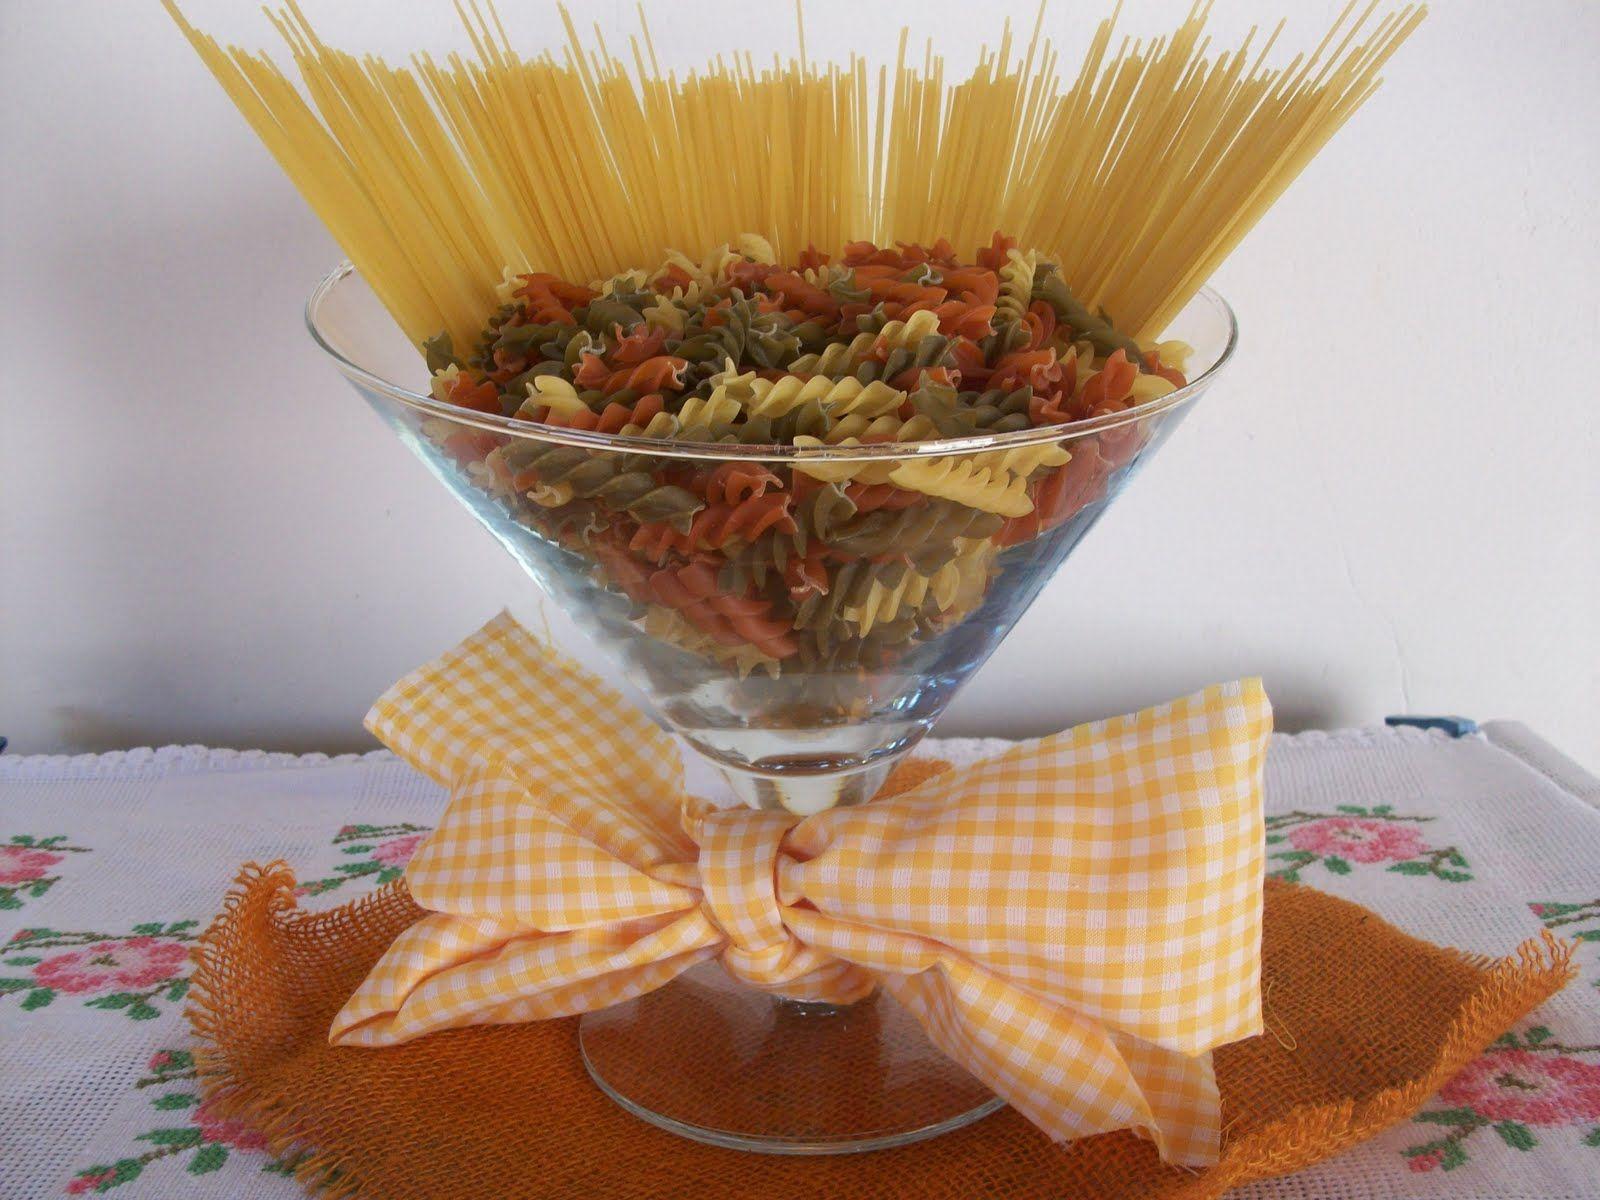 Centro mesa italiano | Crafts | Pinterest | Centro mesa, Italiano y ...